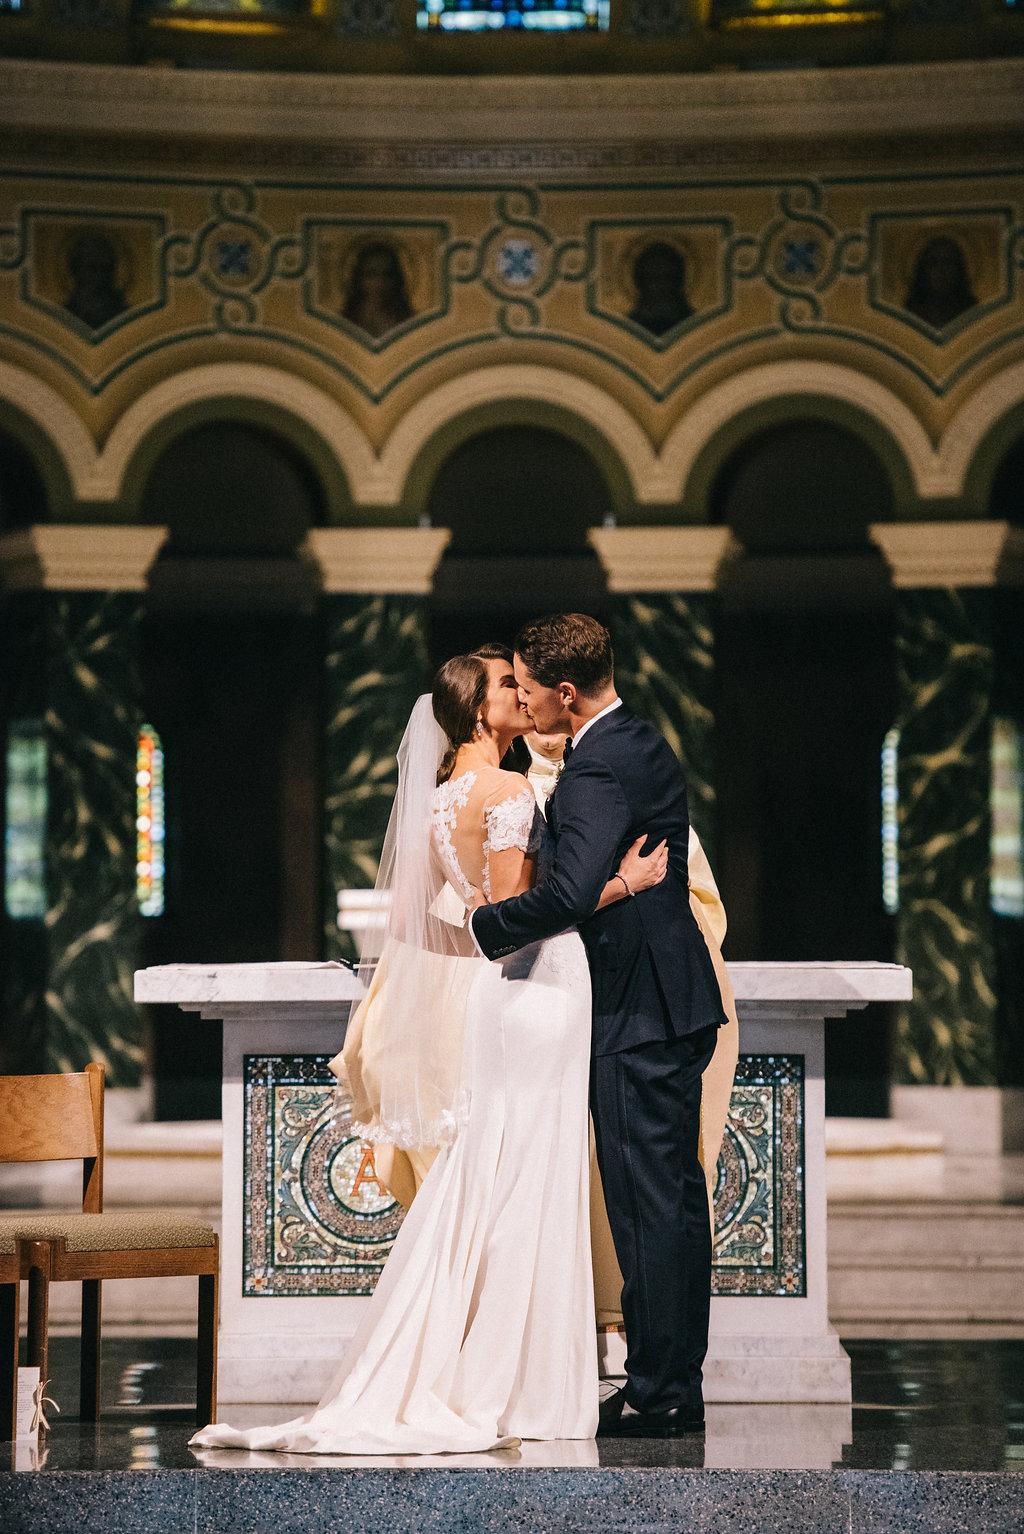 0203--Katelyn_+_Brendan-Wedding_Highlights-Shot_by_Couple_of_Dudes-Joe_Tighe.jpg